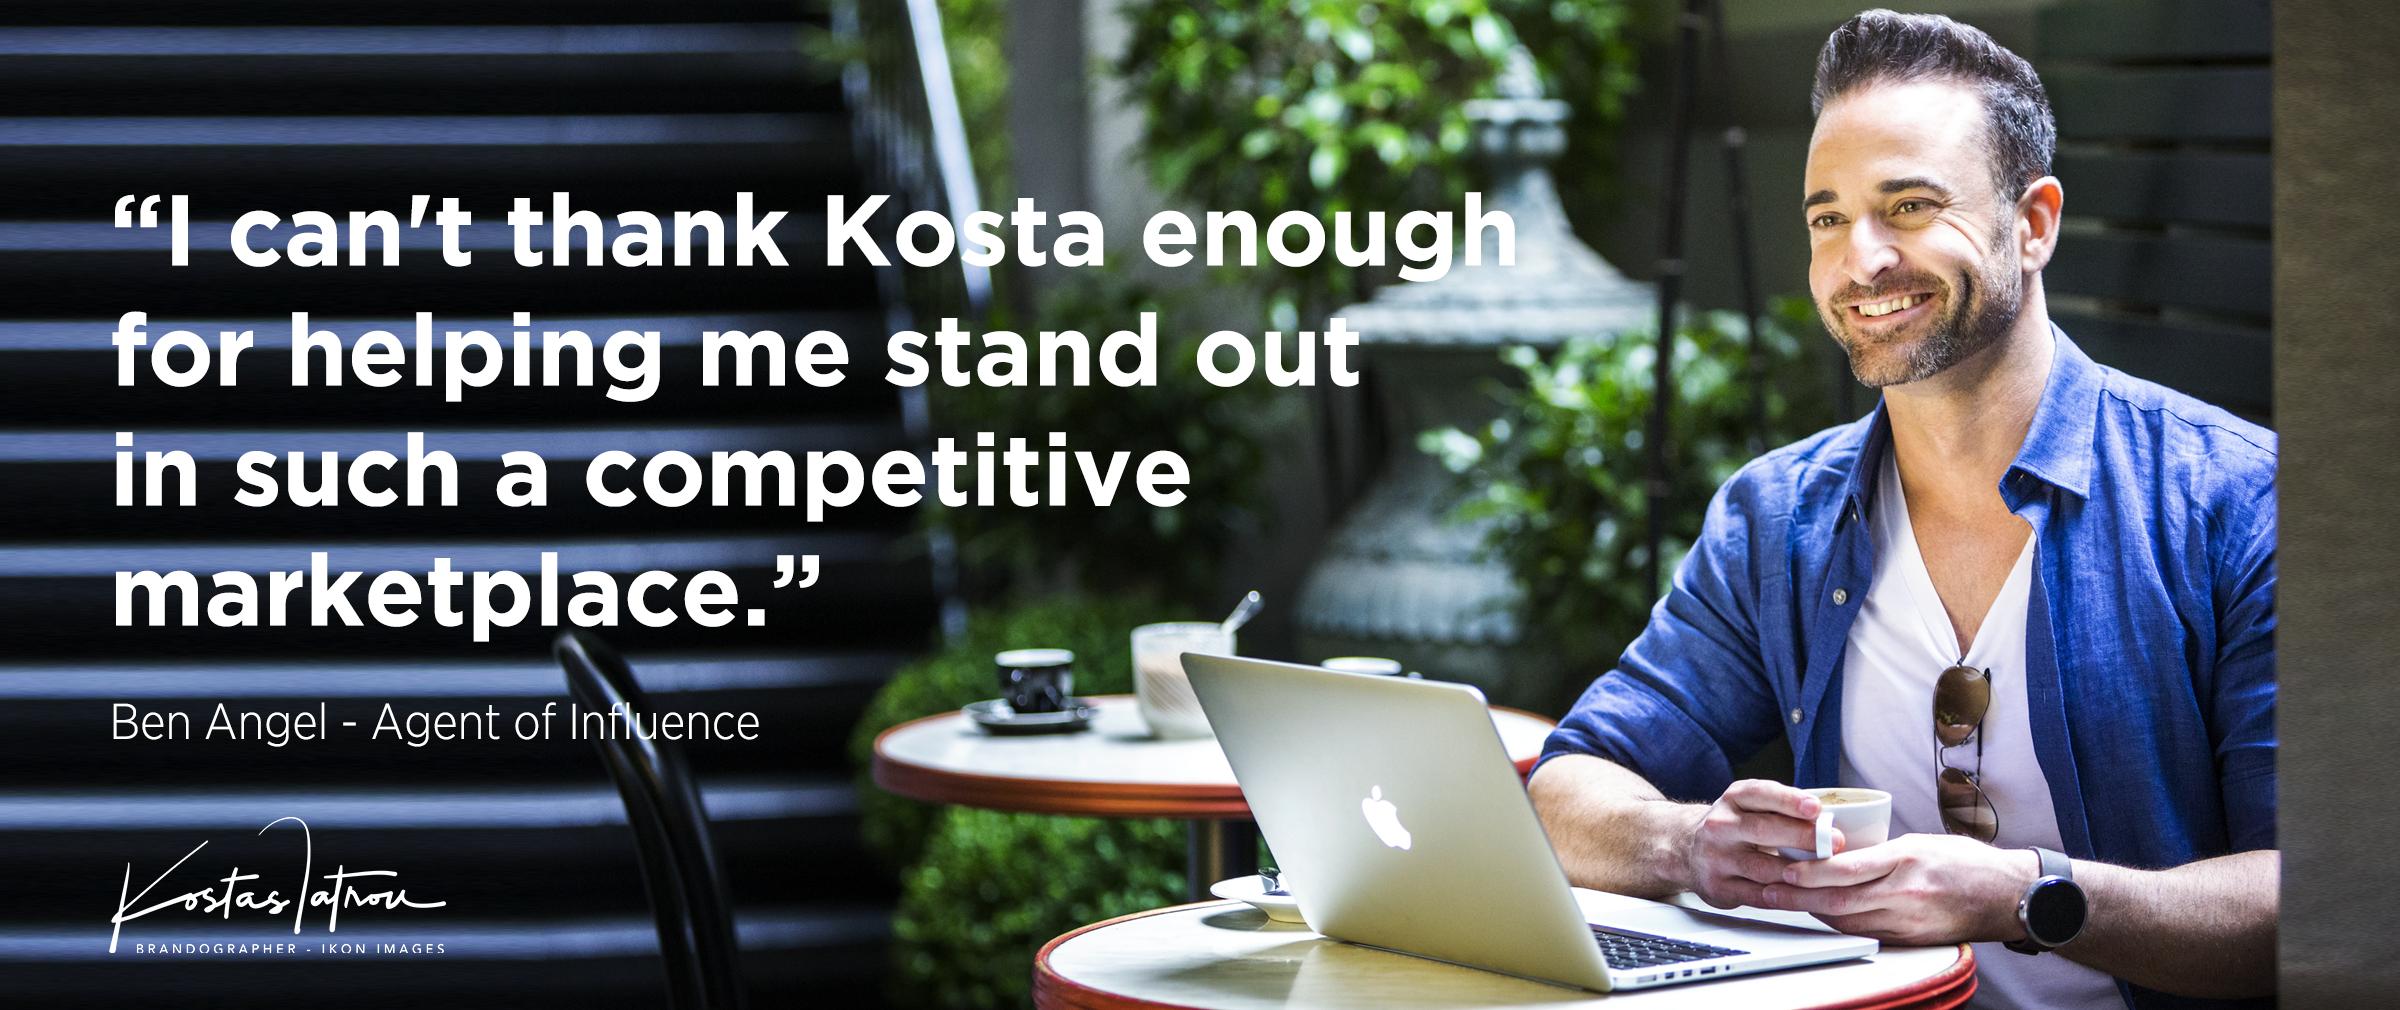 IKON IMAGES Kostas Iatrou Brandographer - Branding Portraits and Branding Strategy